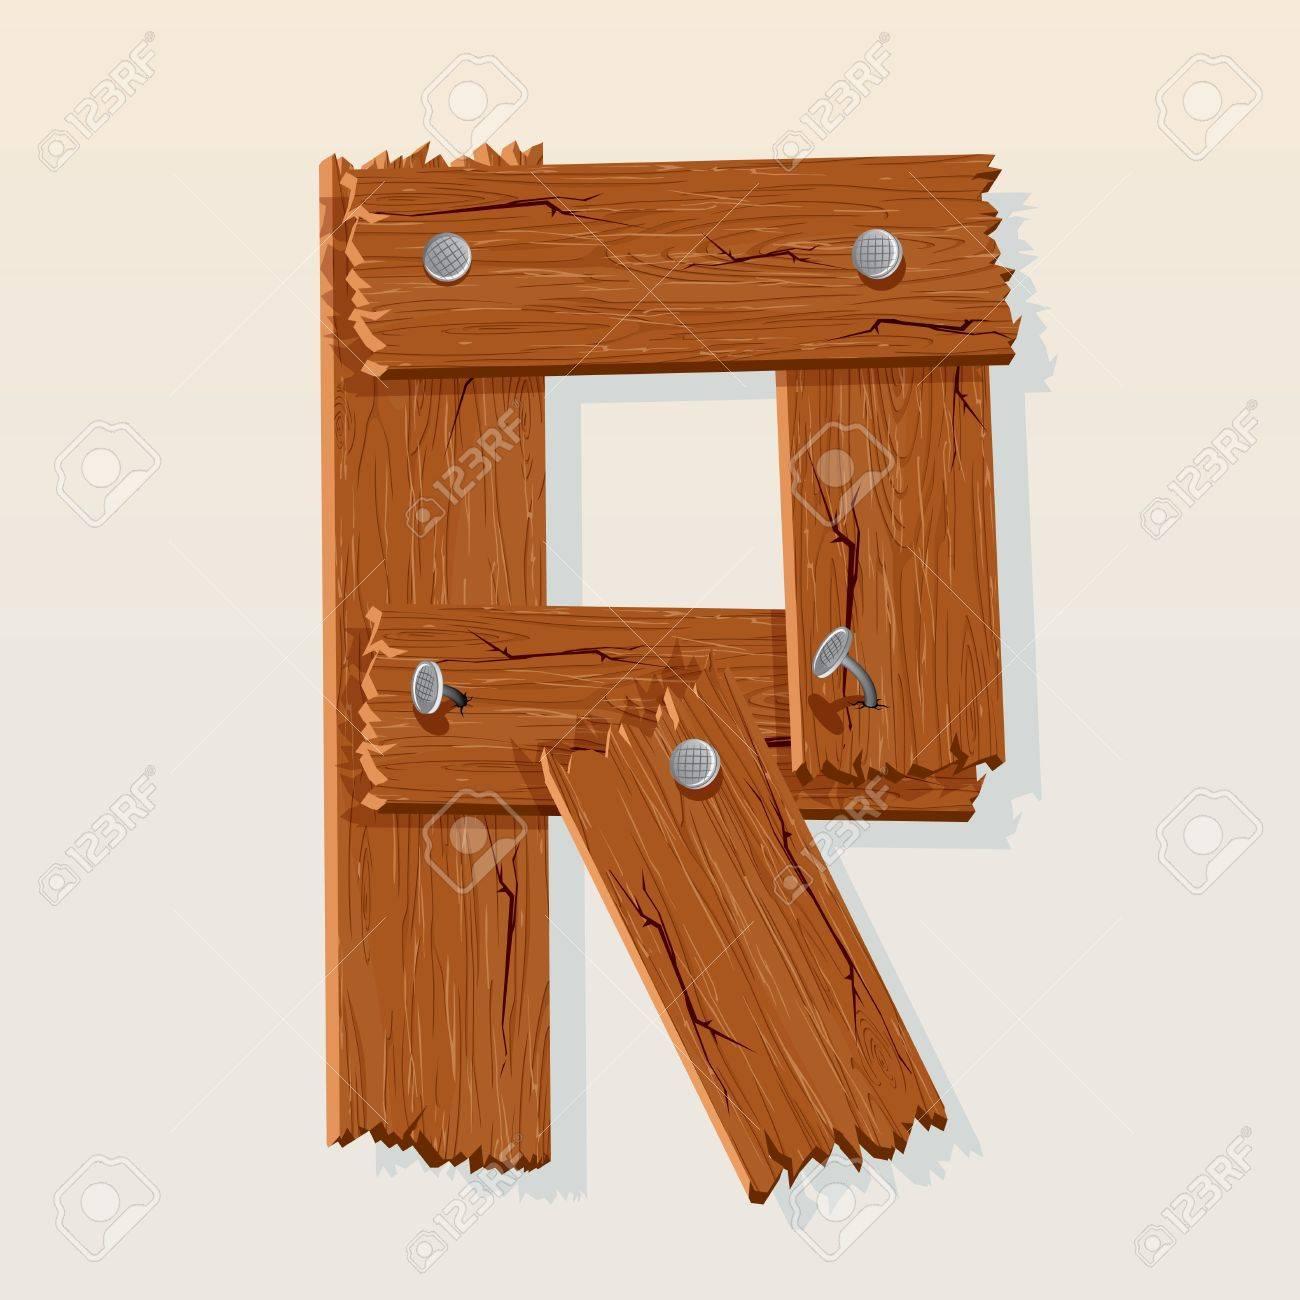 Letter R From vector Wooden Alphabet Stock Vector - 10851043